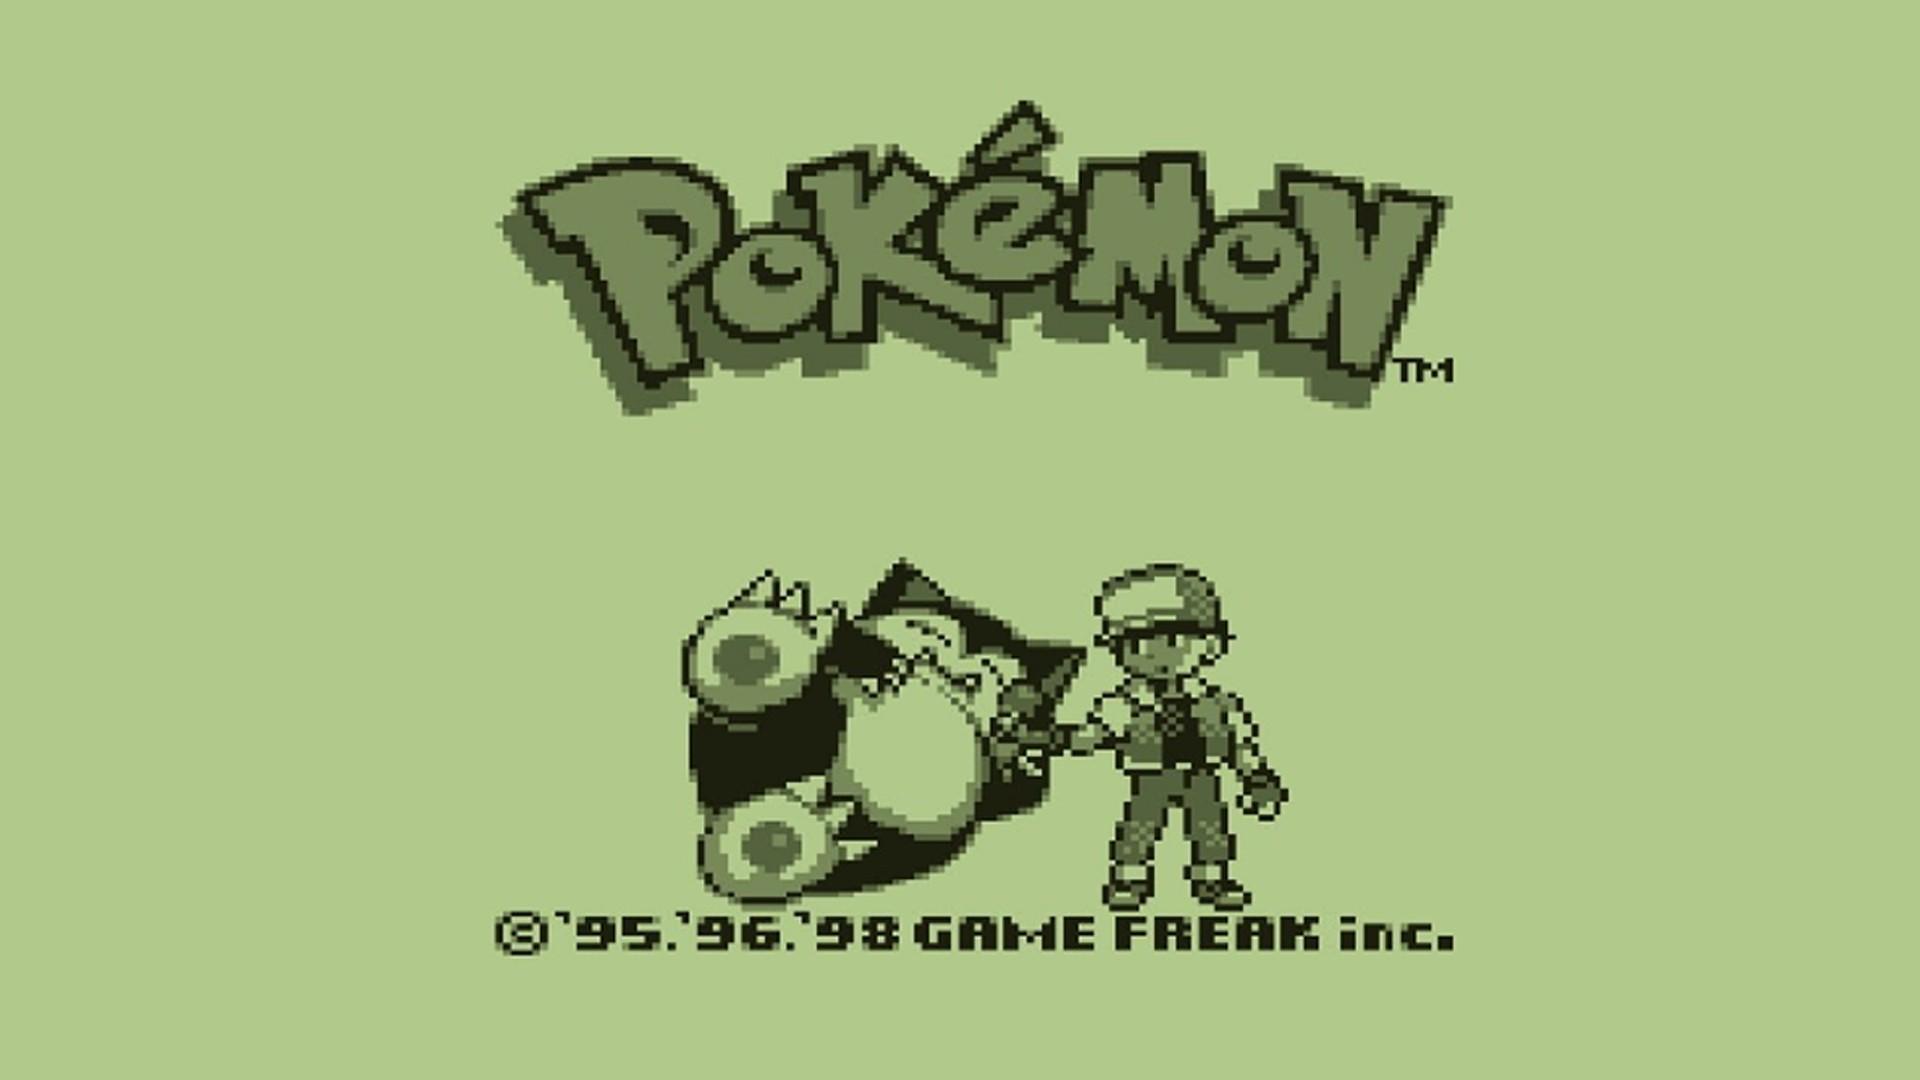 1920x1080 px green pokemon retro games video games